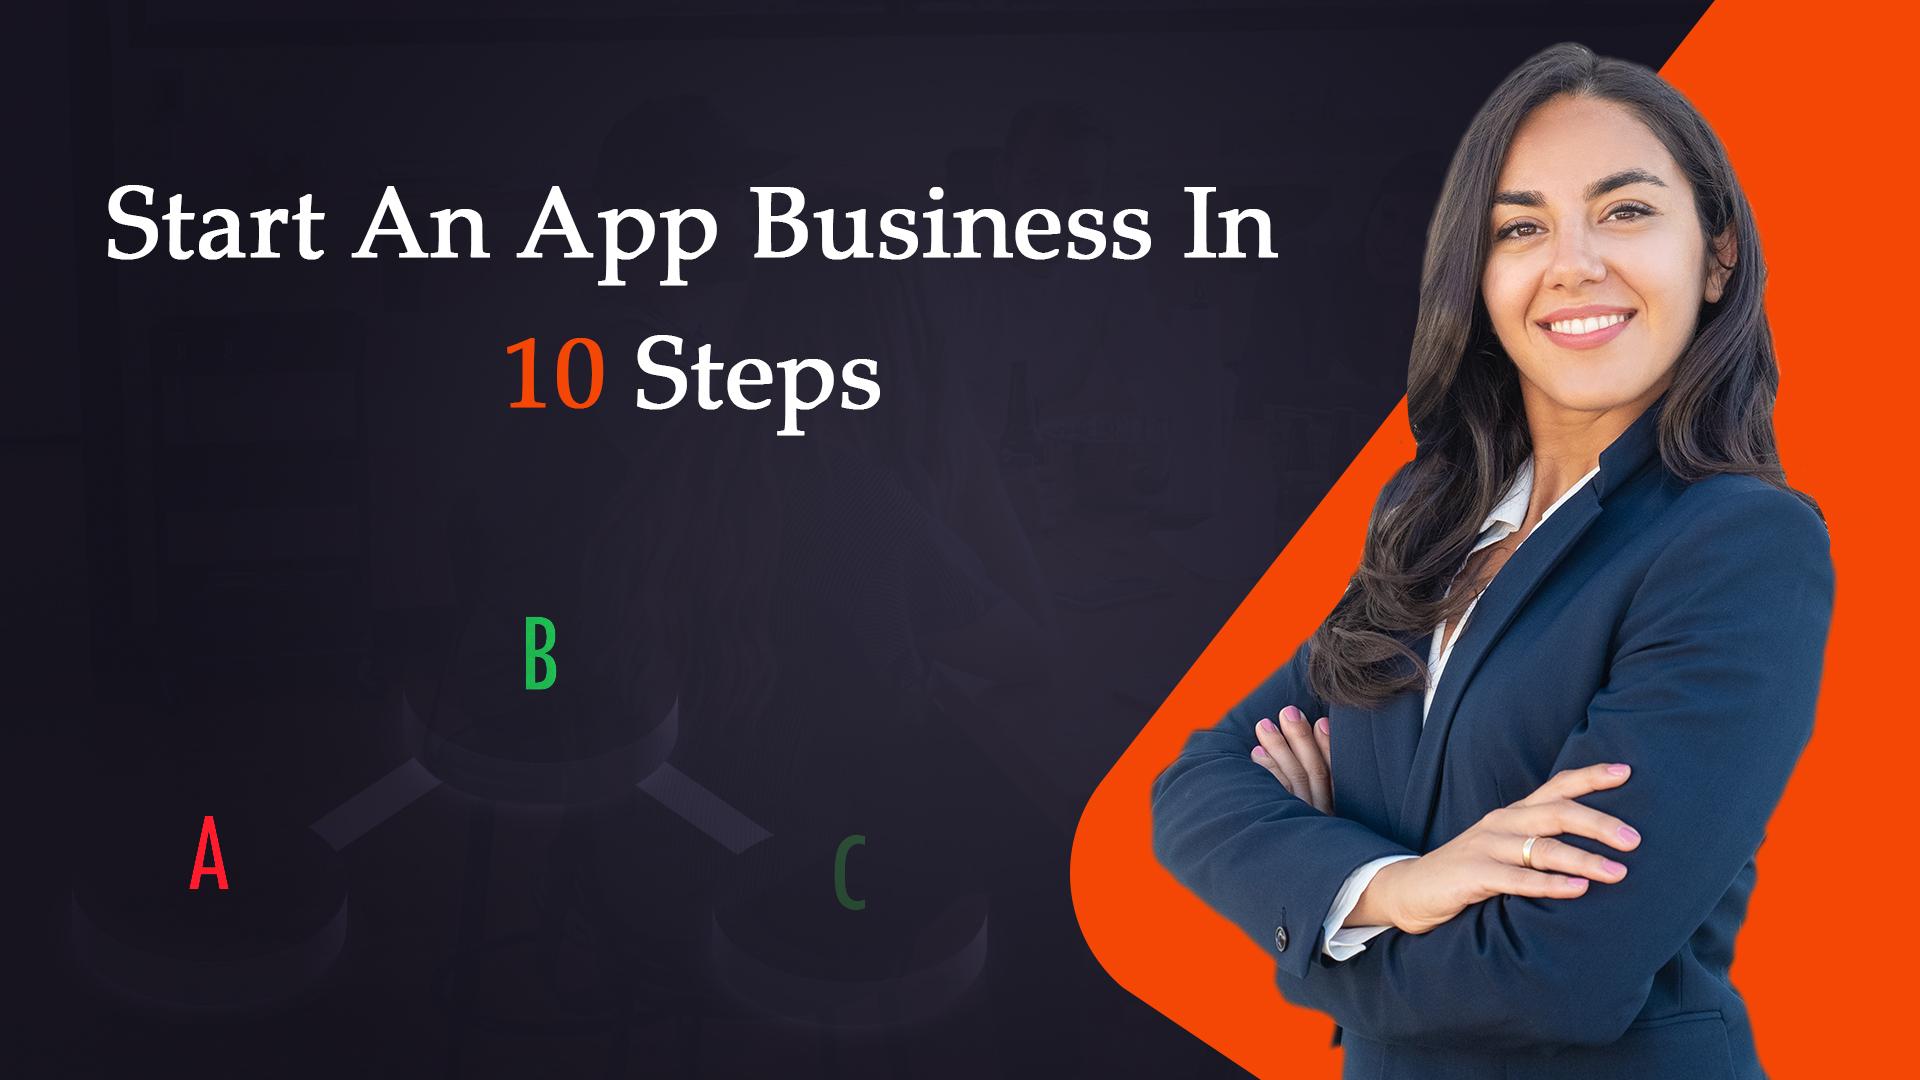 Start an App Business in 10 Steps